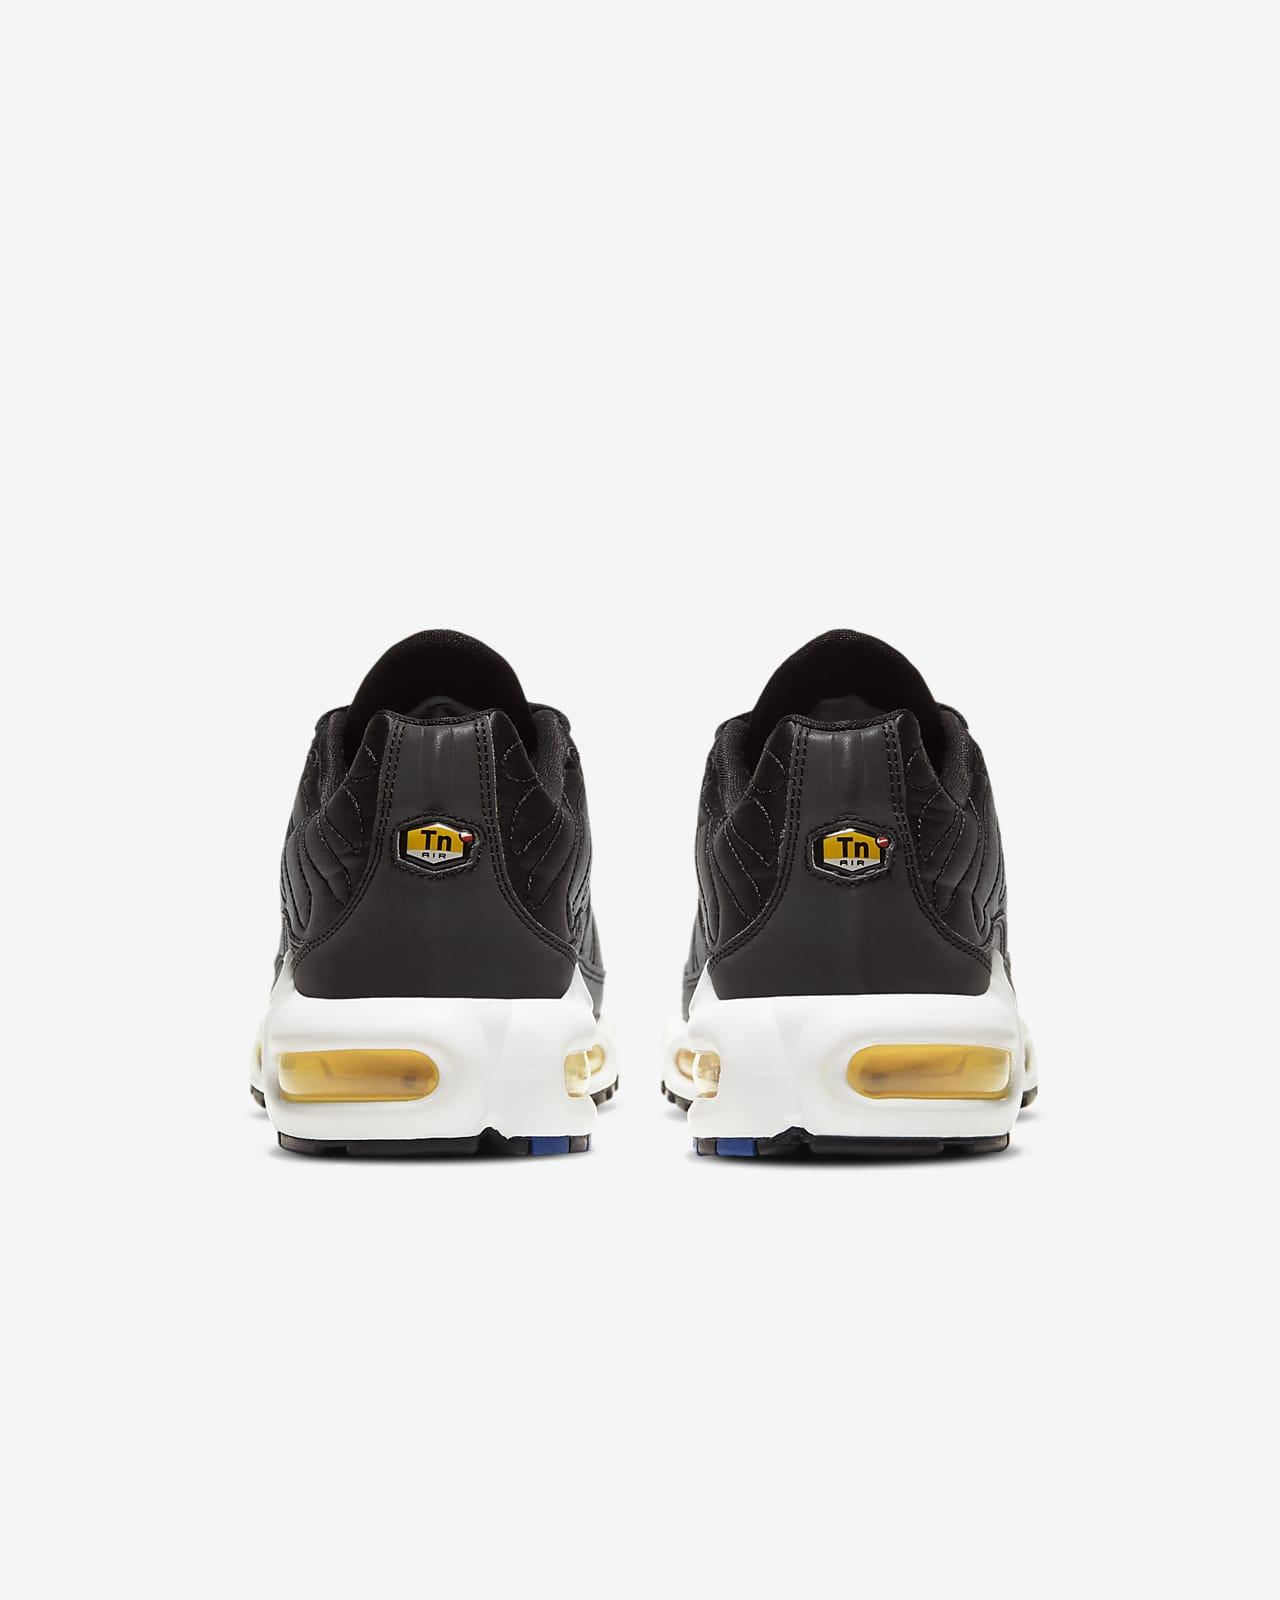 Nike Air Max Plus Women's Shoe. Nike LU